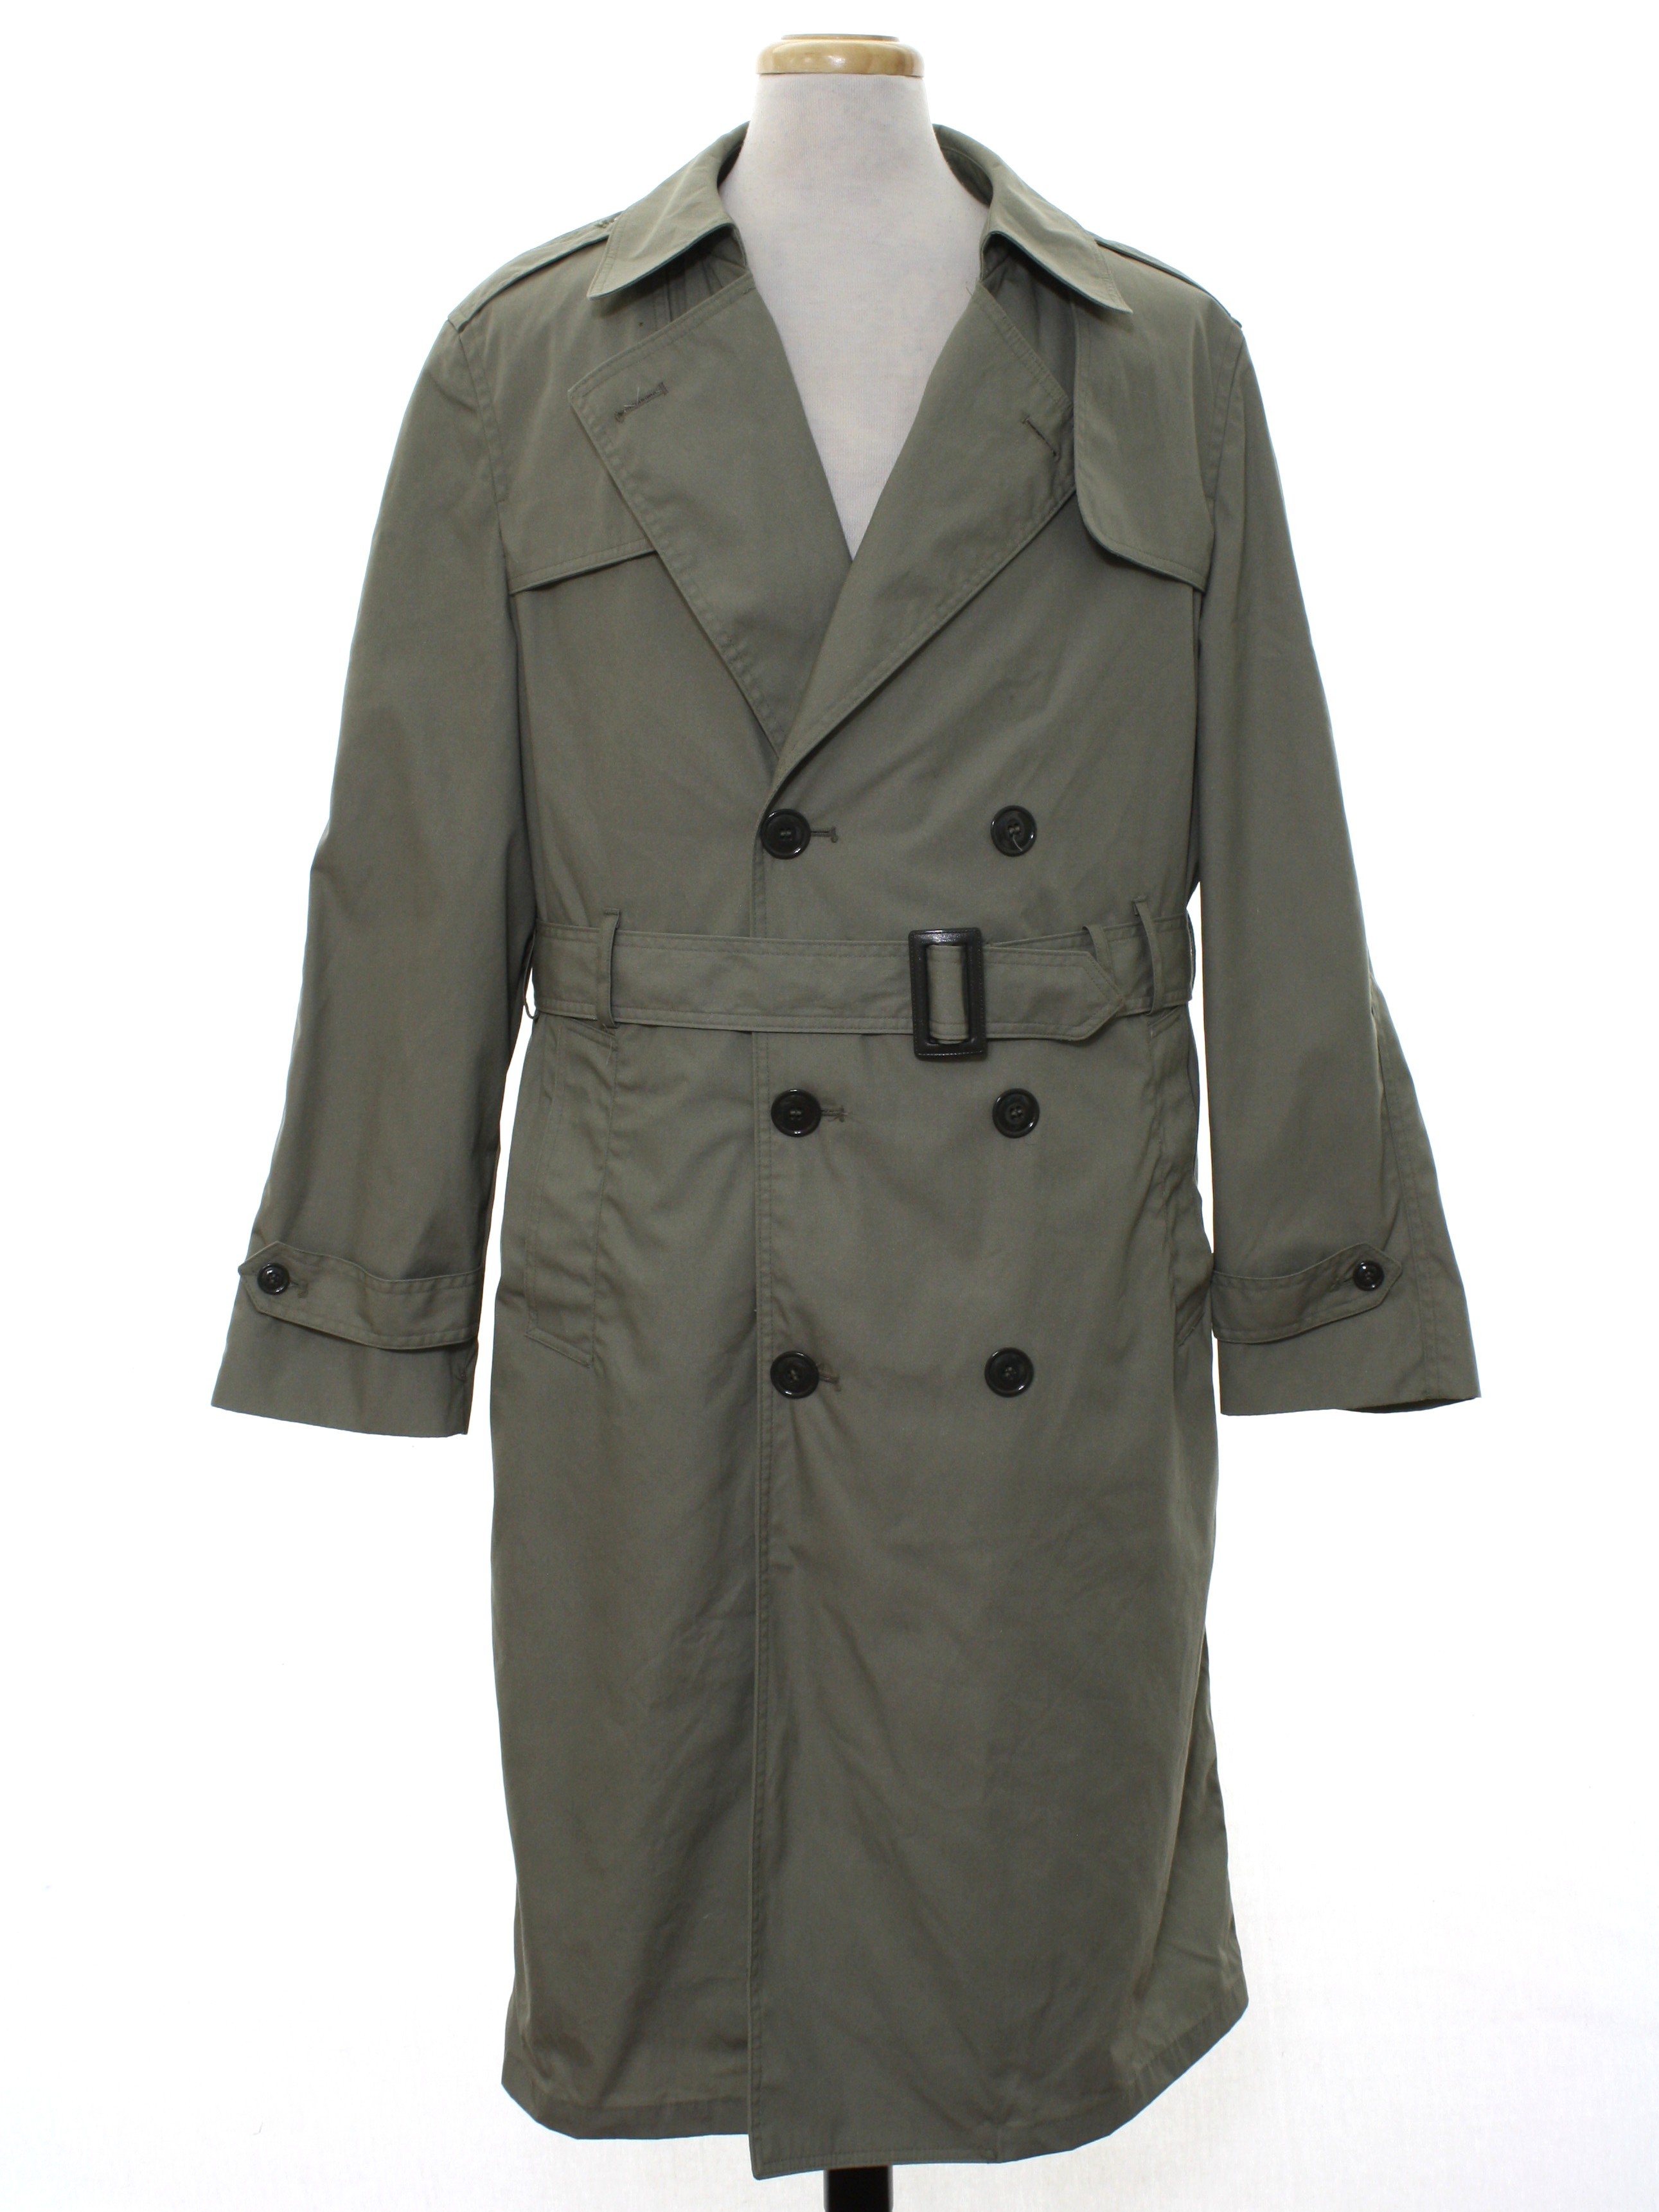 1960s Vintage Med MattGlossy /'Flash of Lightning/' MOD Green Coat Jacket Dress Buttons-27mm